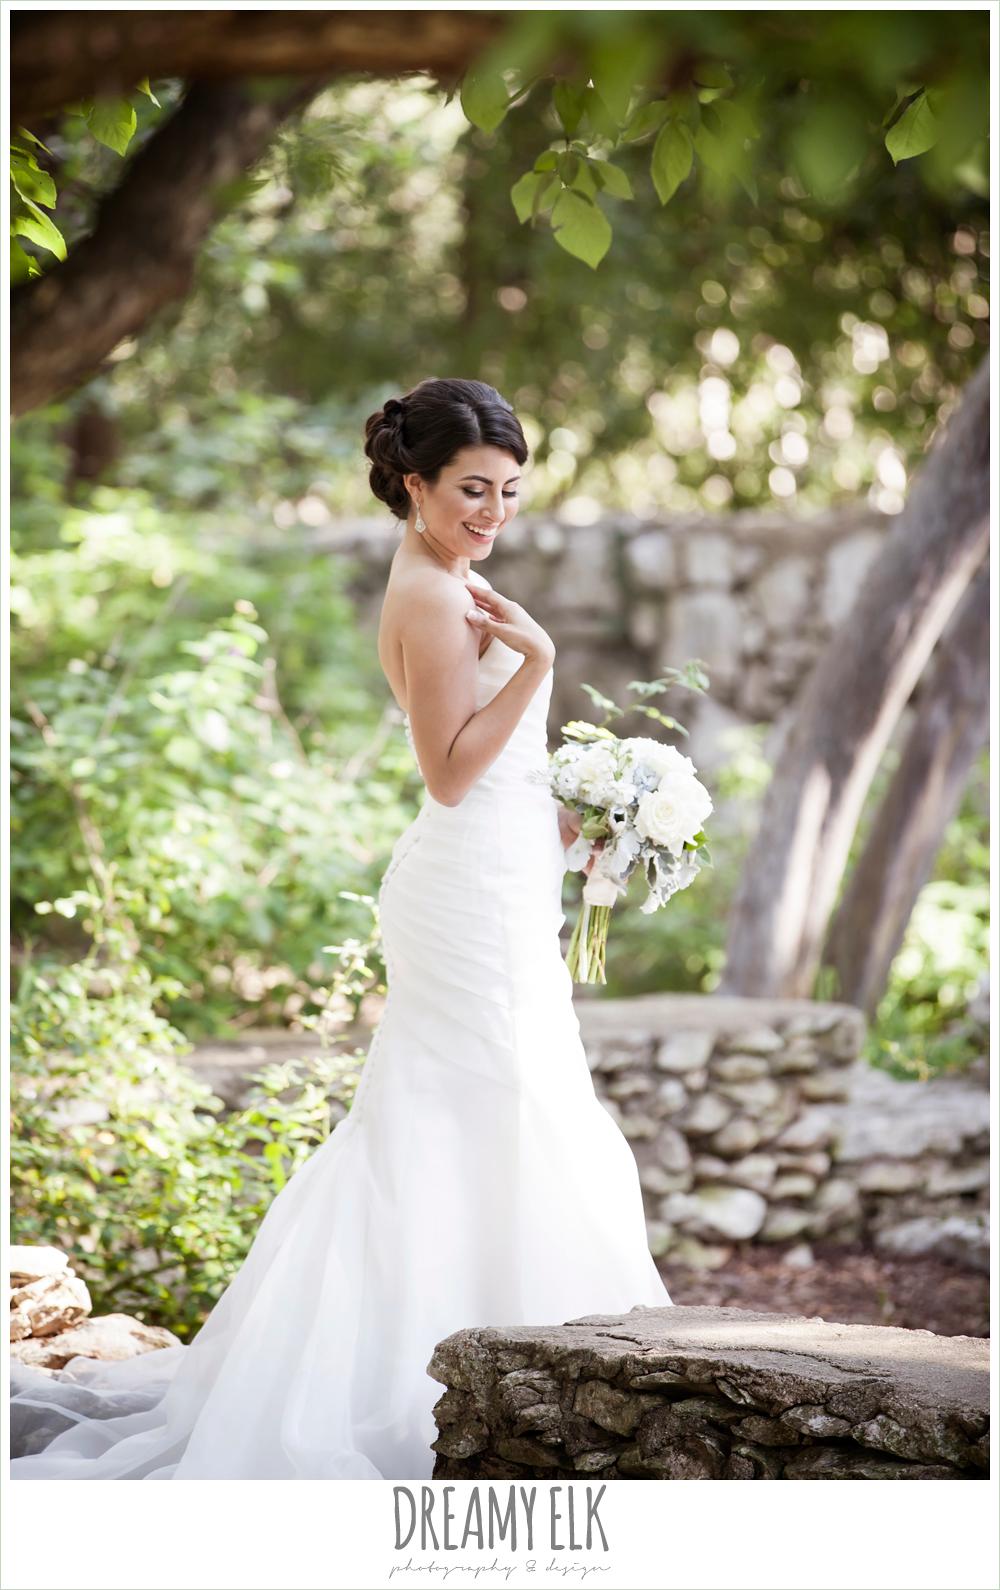 Wedding Dresses S In Austin Tx : Paola bridals mayfield park austin texas dreamy elk